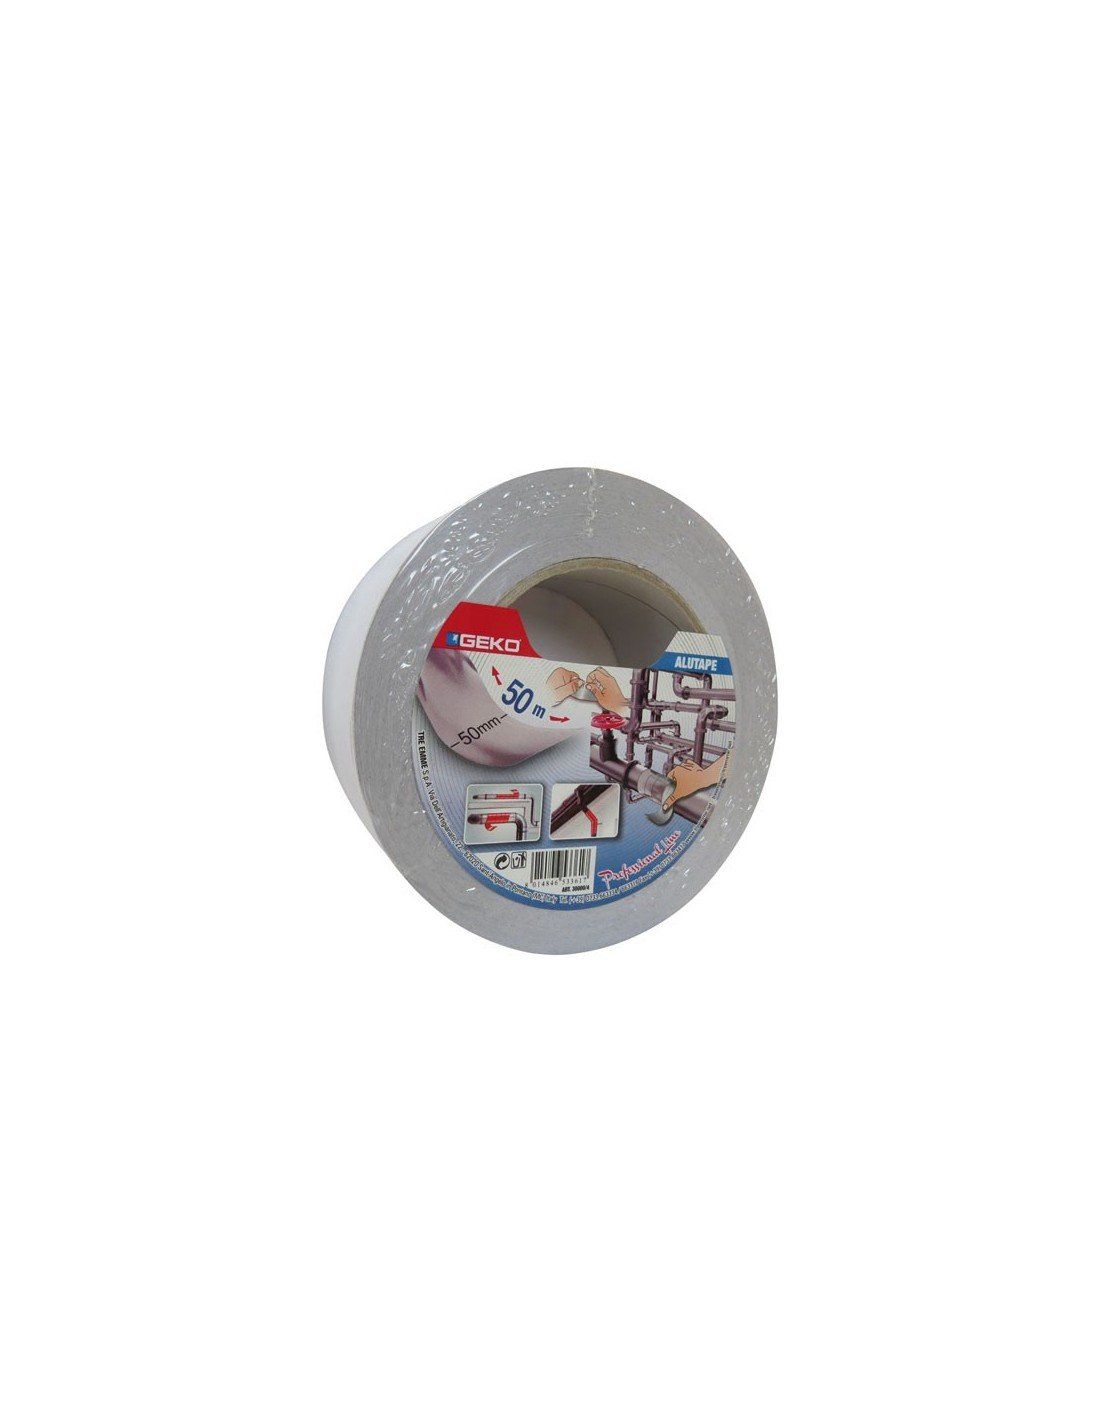 Geko 30000/4 Cinta Adhesiva, 50 mm x 50 m S. I. E. R. S.A. Geko_30000/4